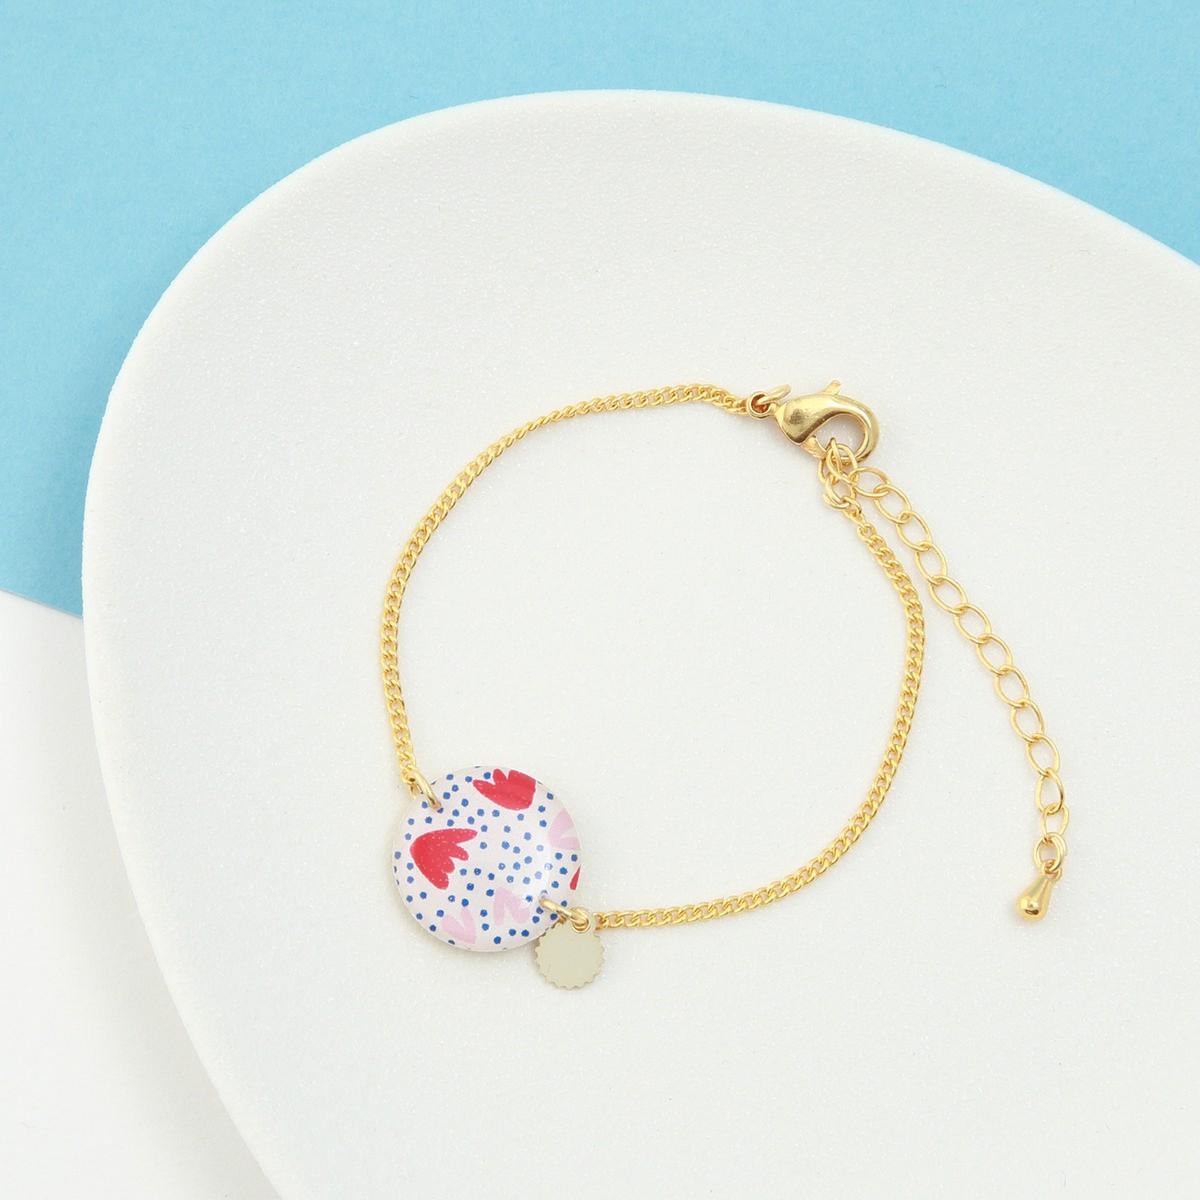 Bracelet femme résiné La Belle Camille Bracelet Nina or